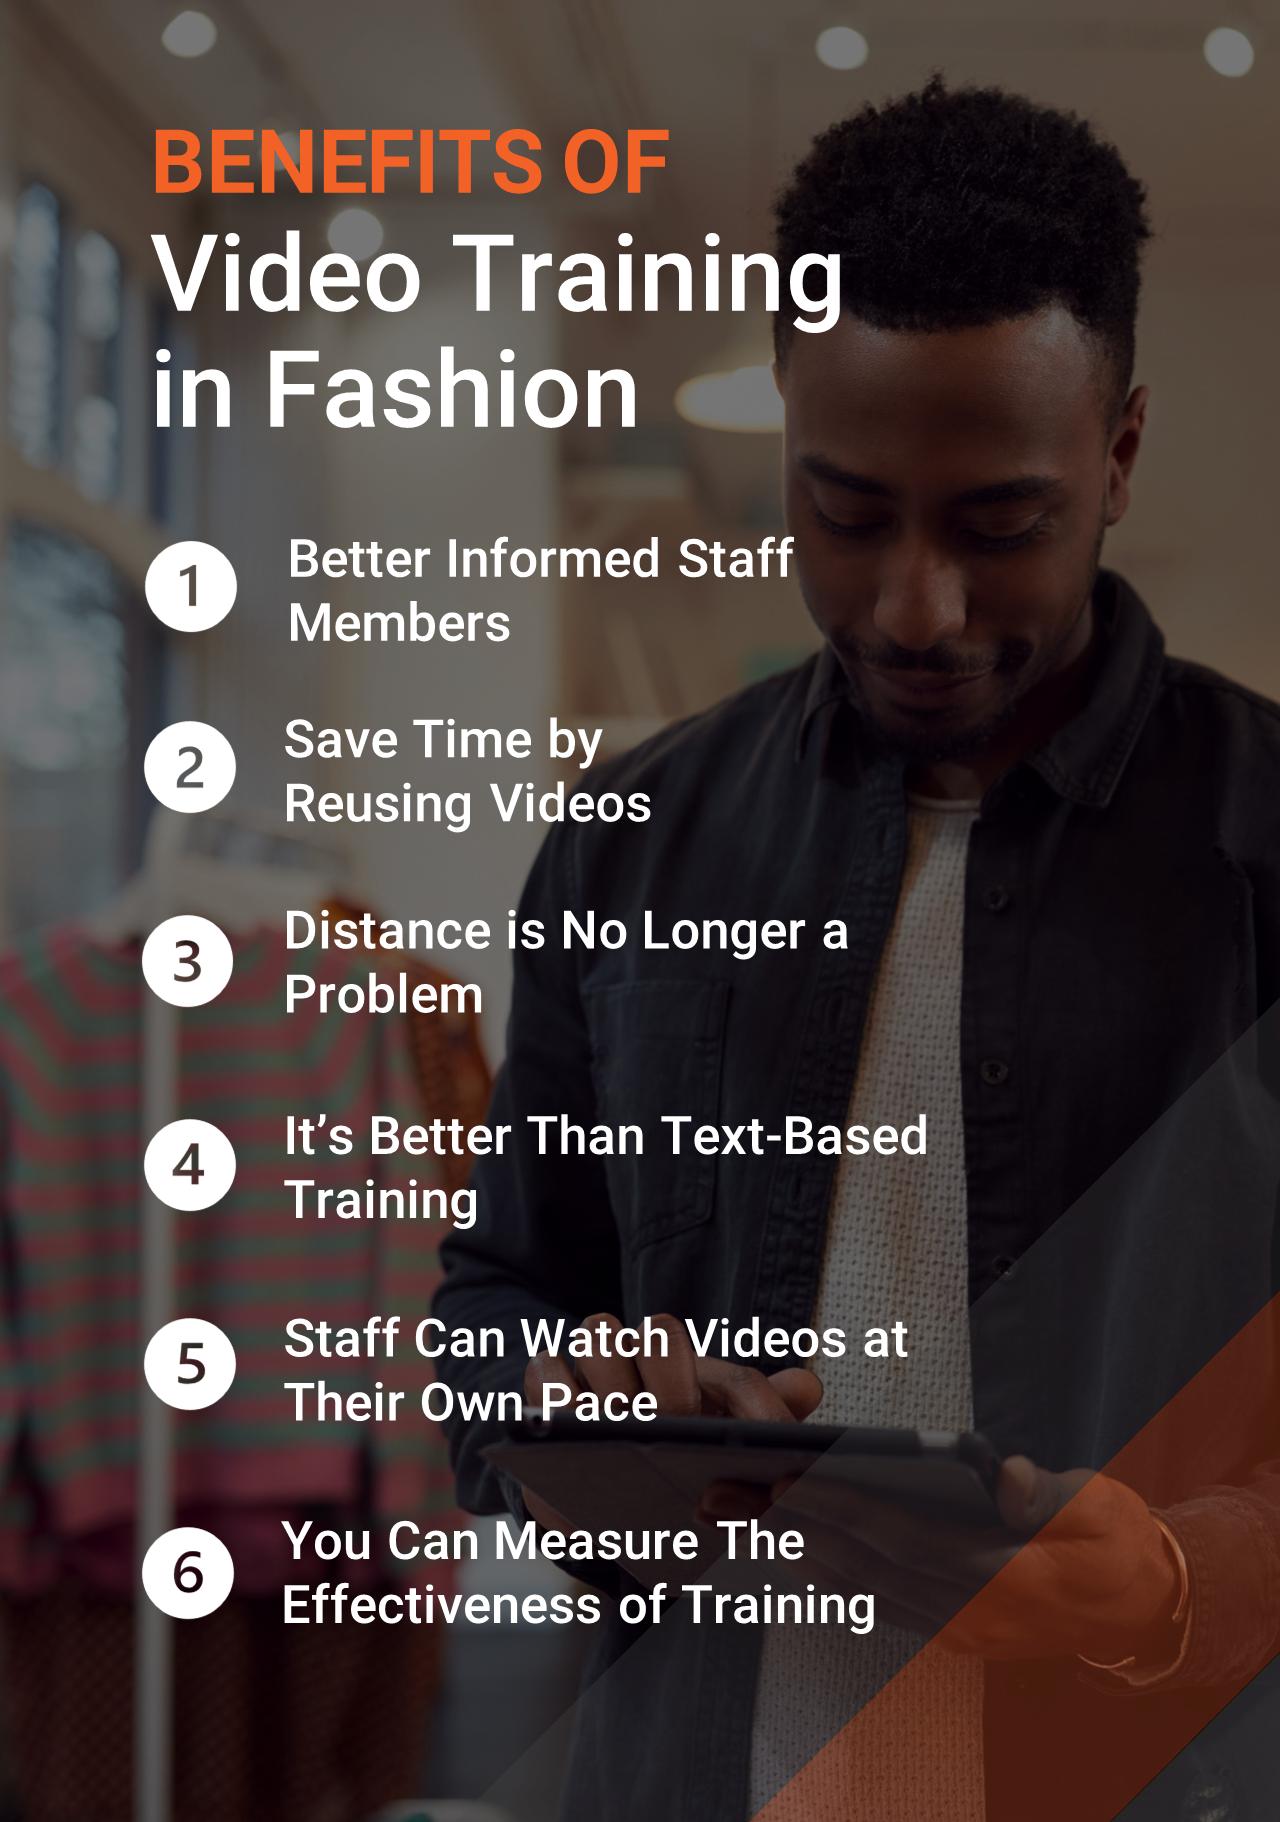 Benefits of Video Training of Fashion Retail Staff